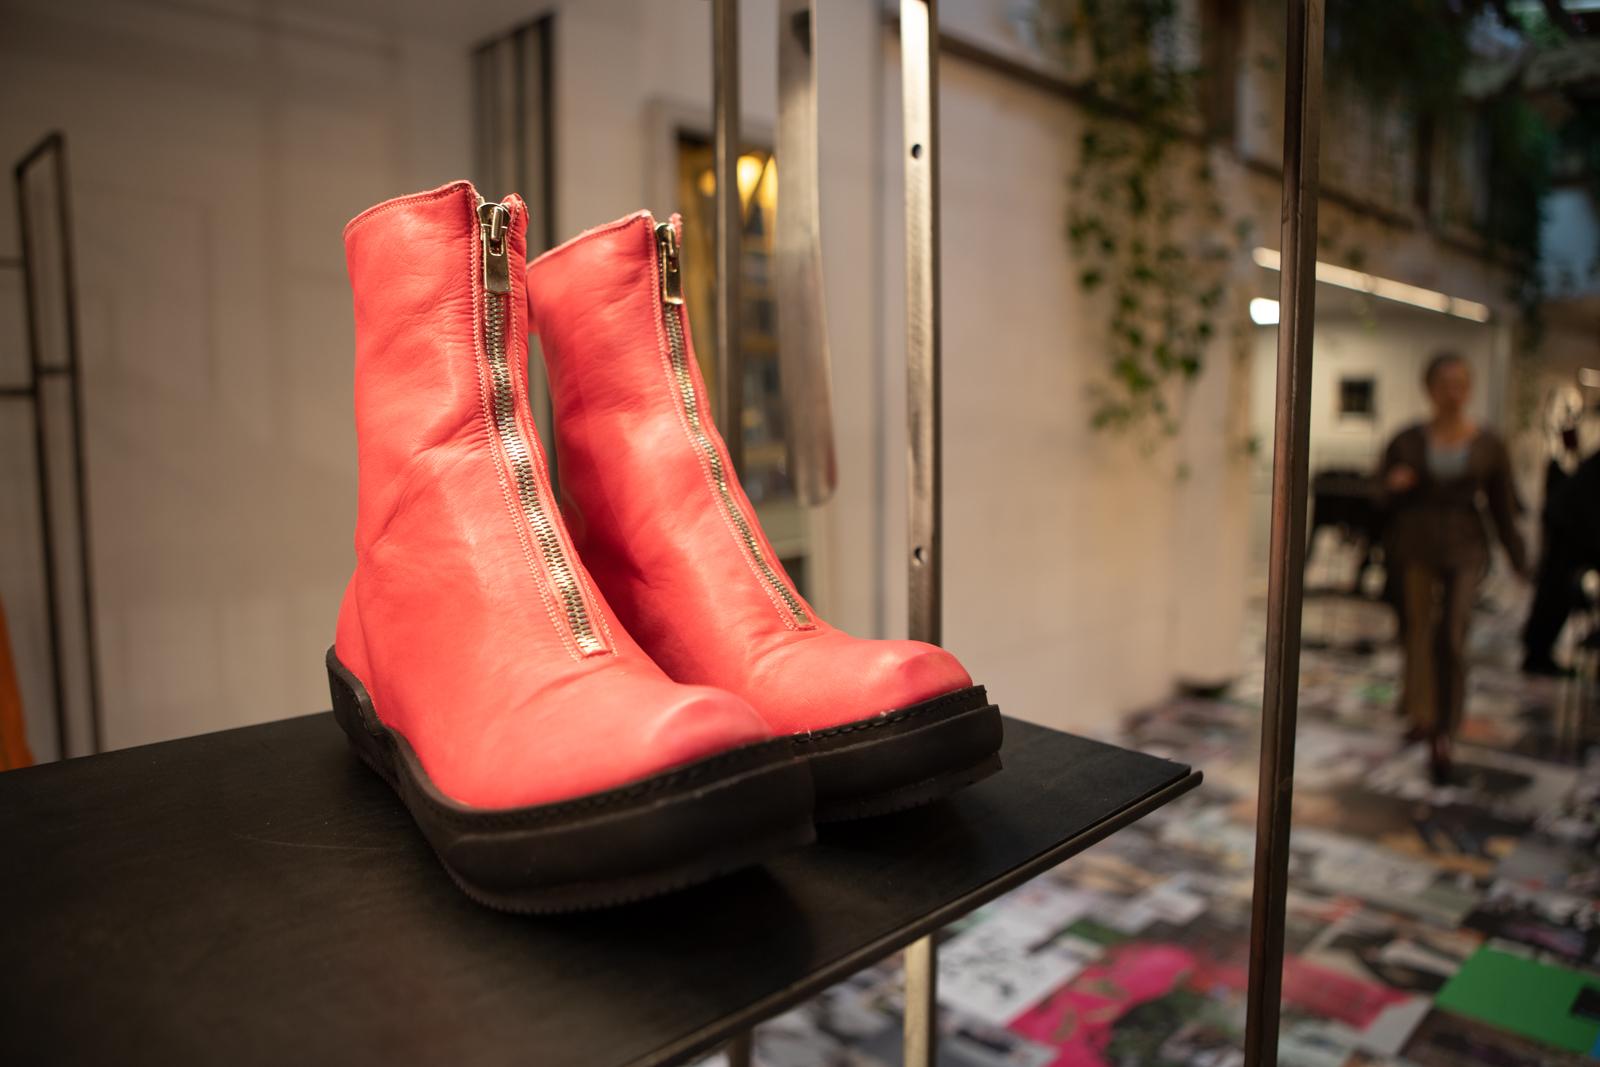 Guidi PLS Sneakers in Pink FW20